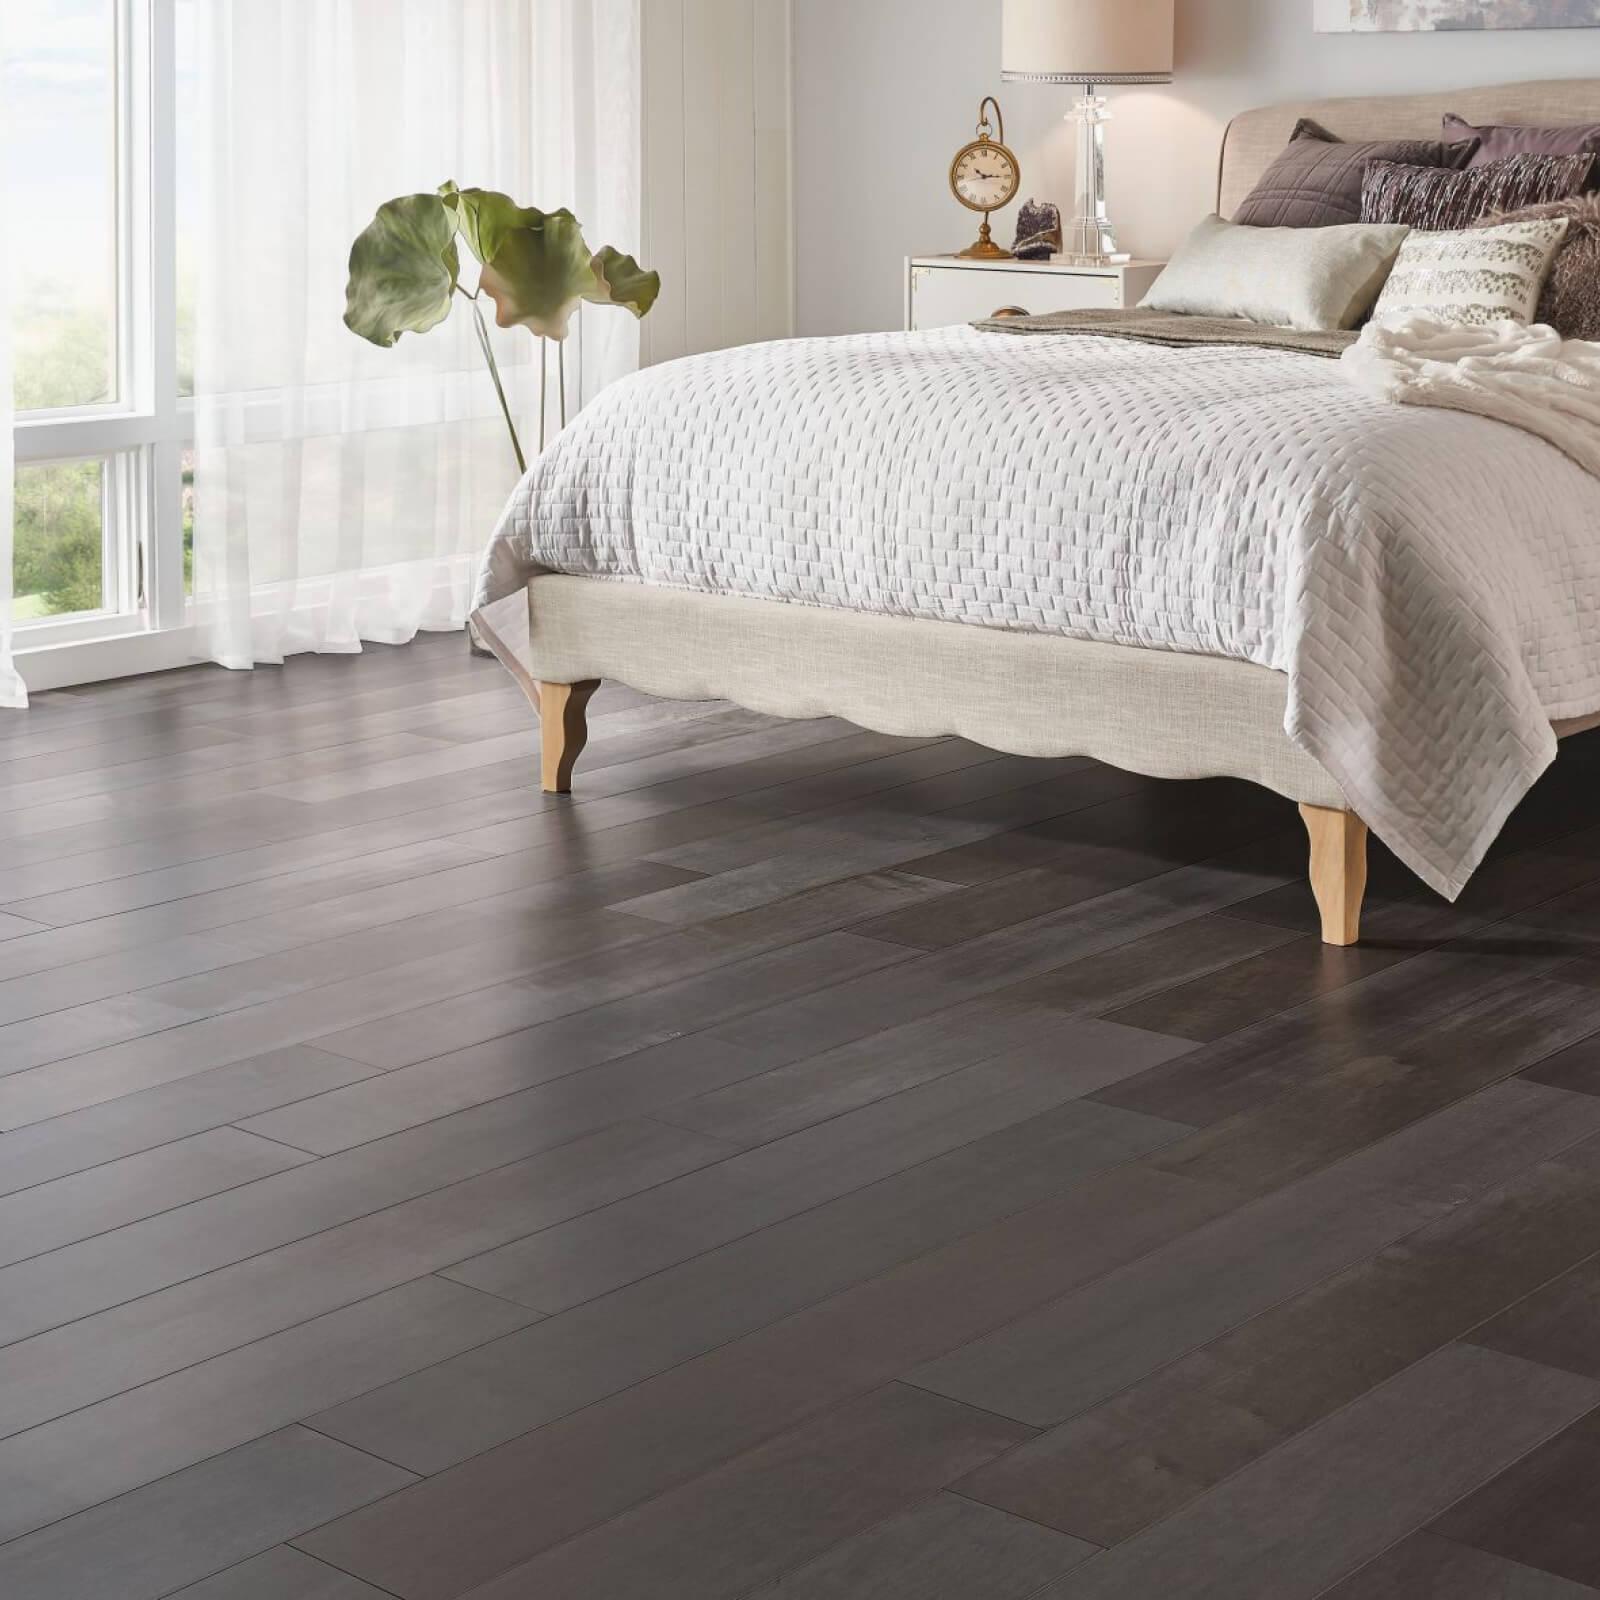 Solid or Engineered Hardwood | Owens Supply Company, Inc